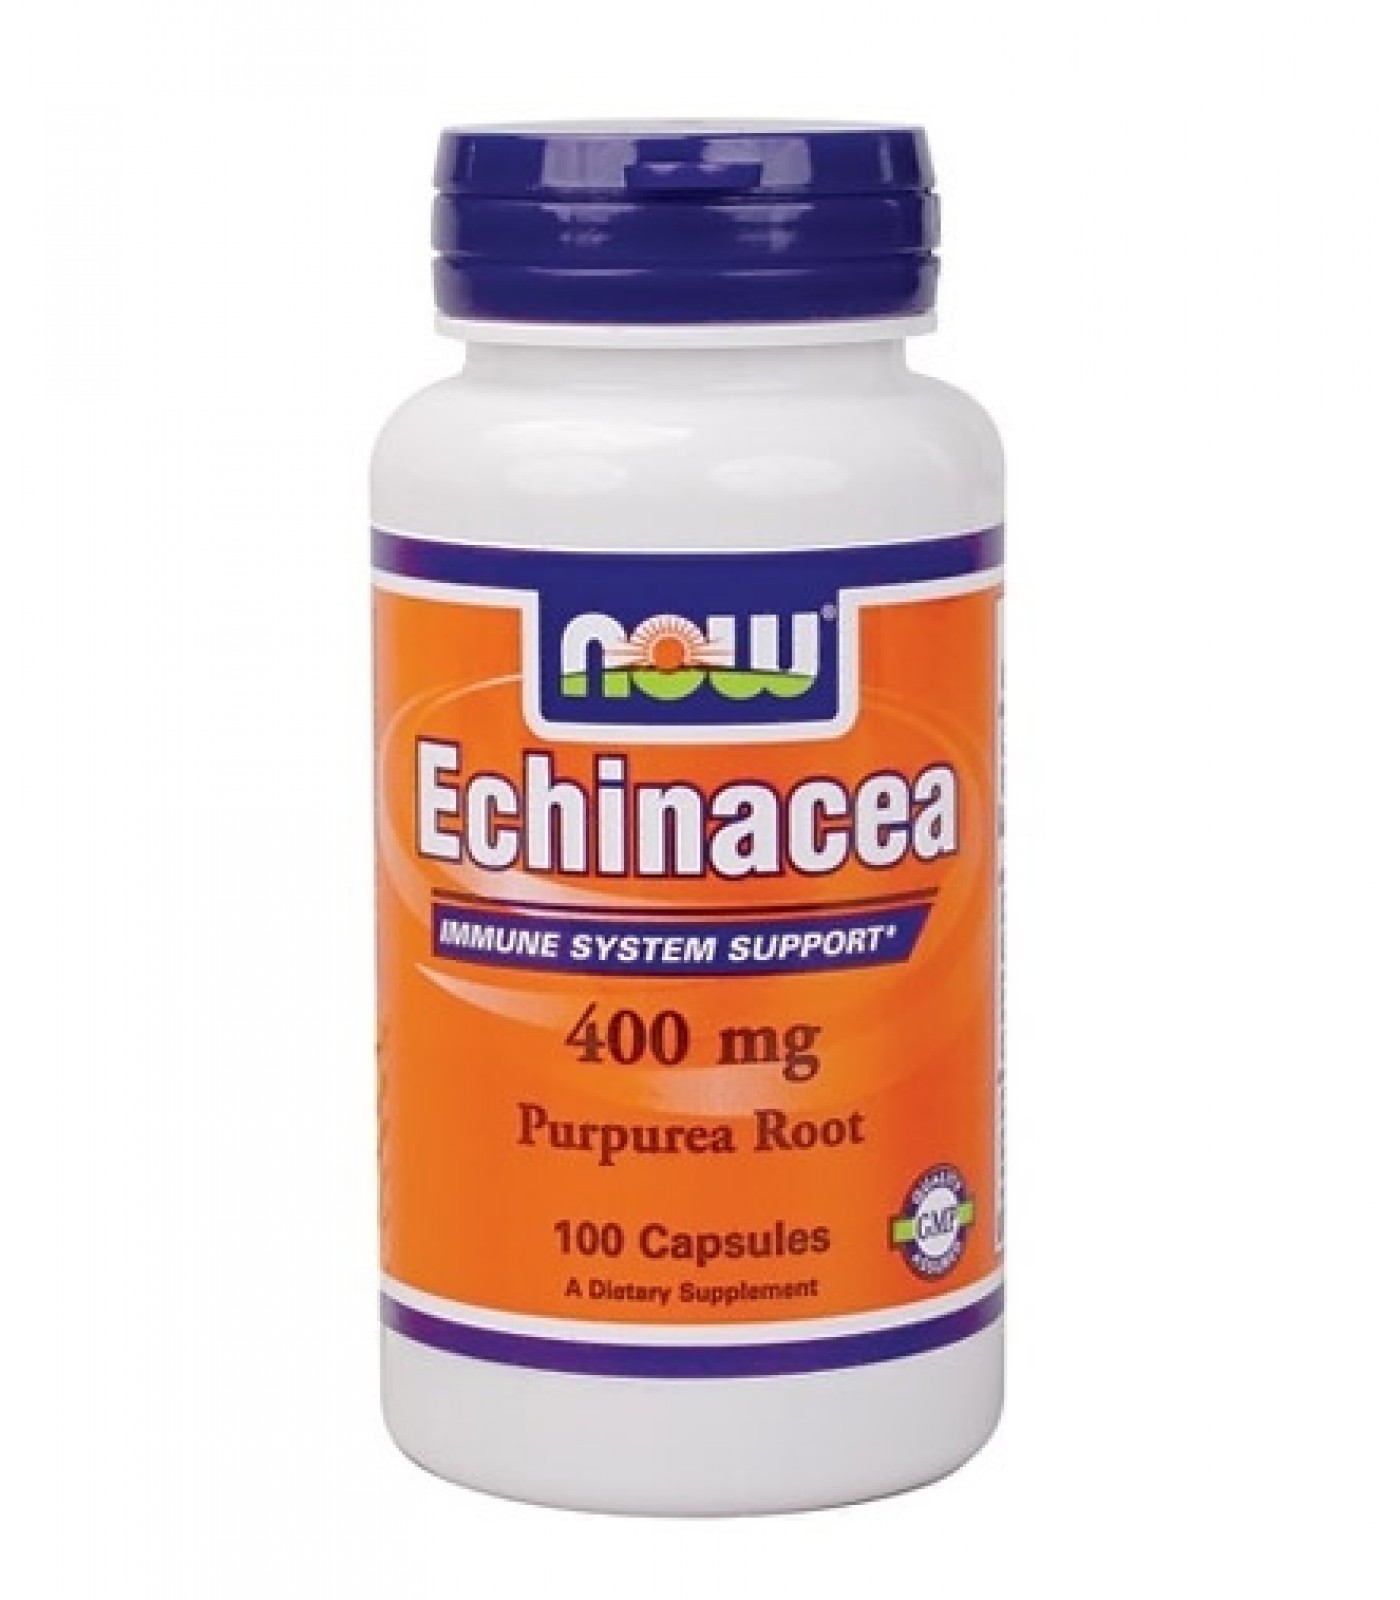 NOW - Echinacea 400mg. / 100 Caps.